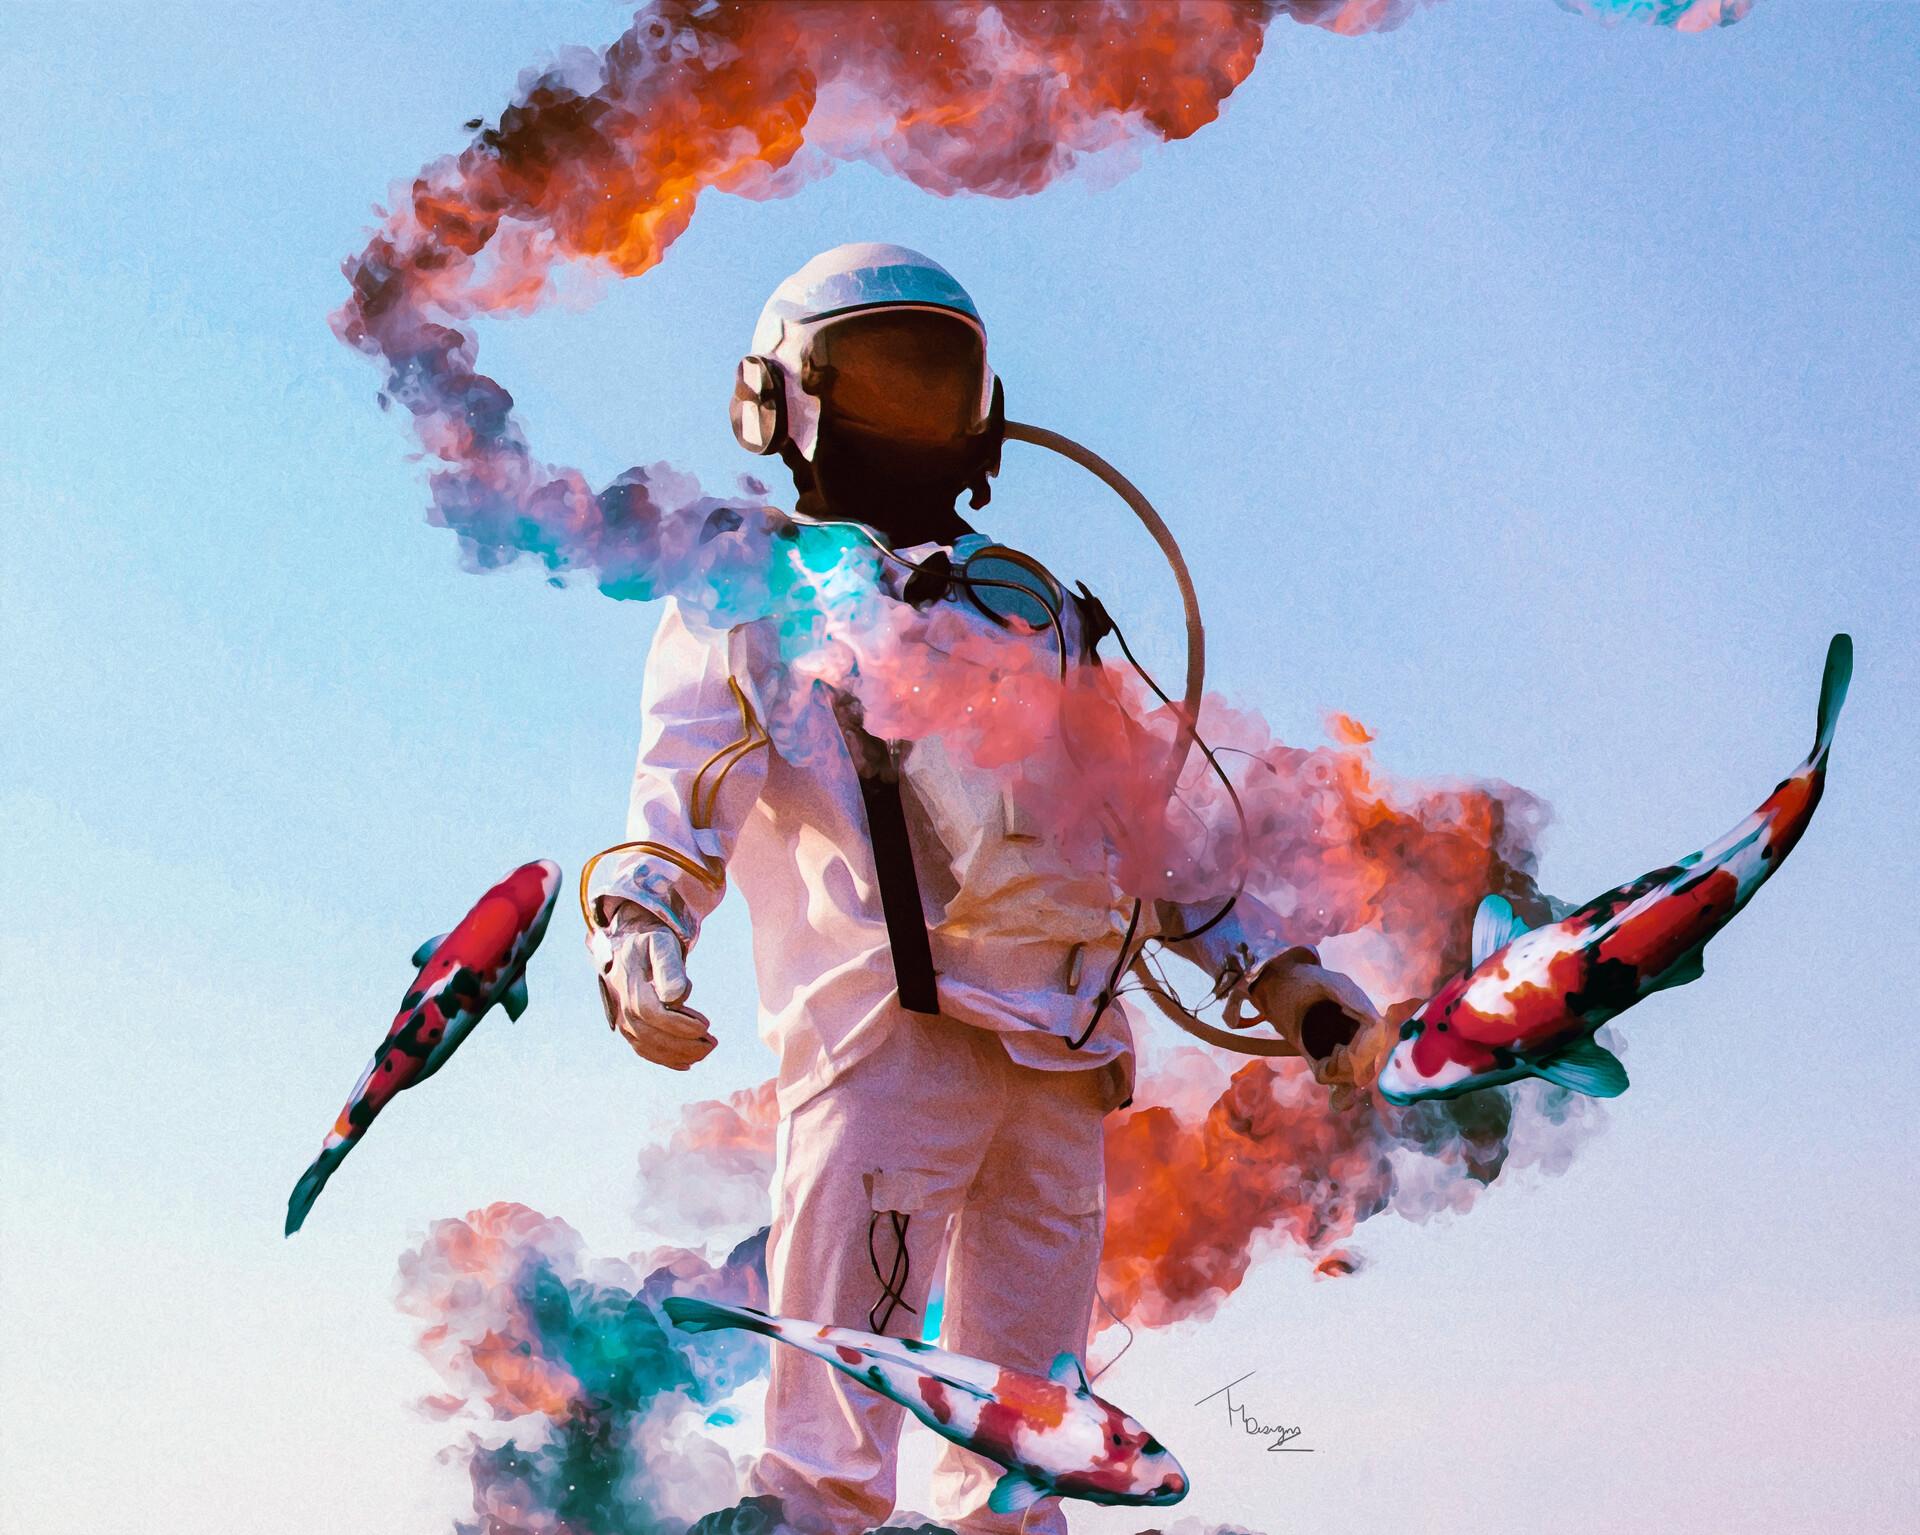 Space Suit Fish Smoke 1920x1535